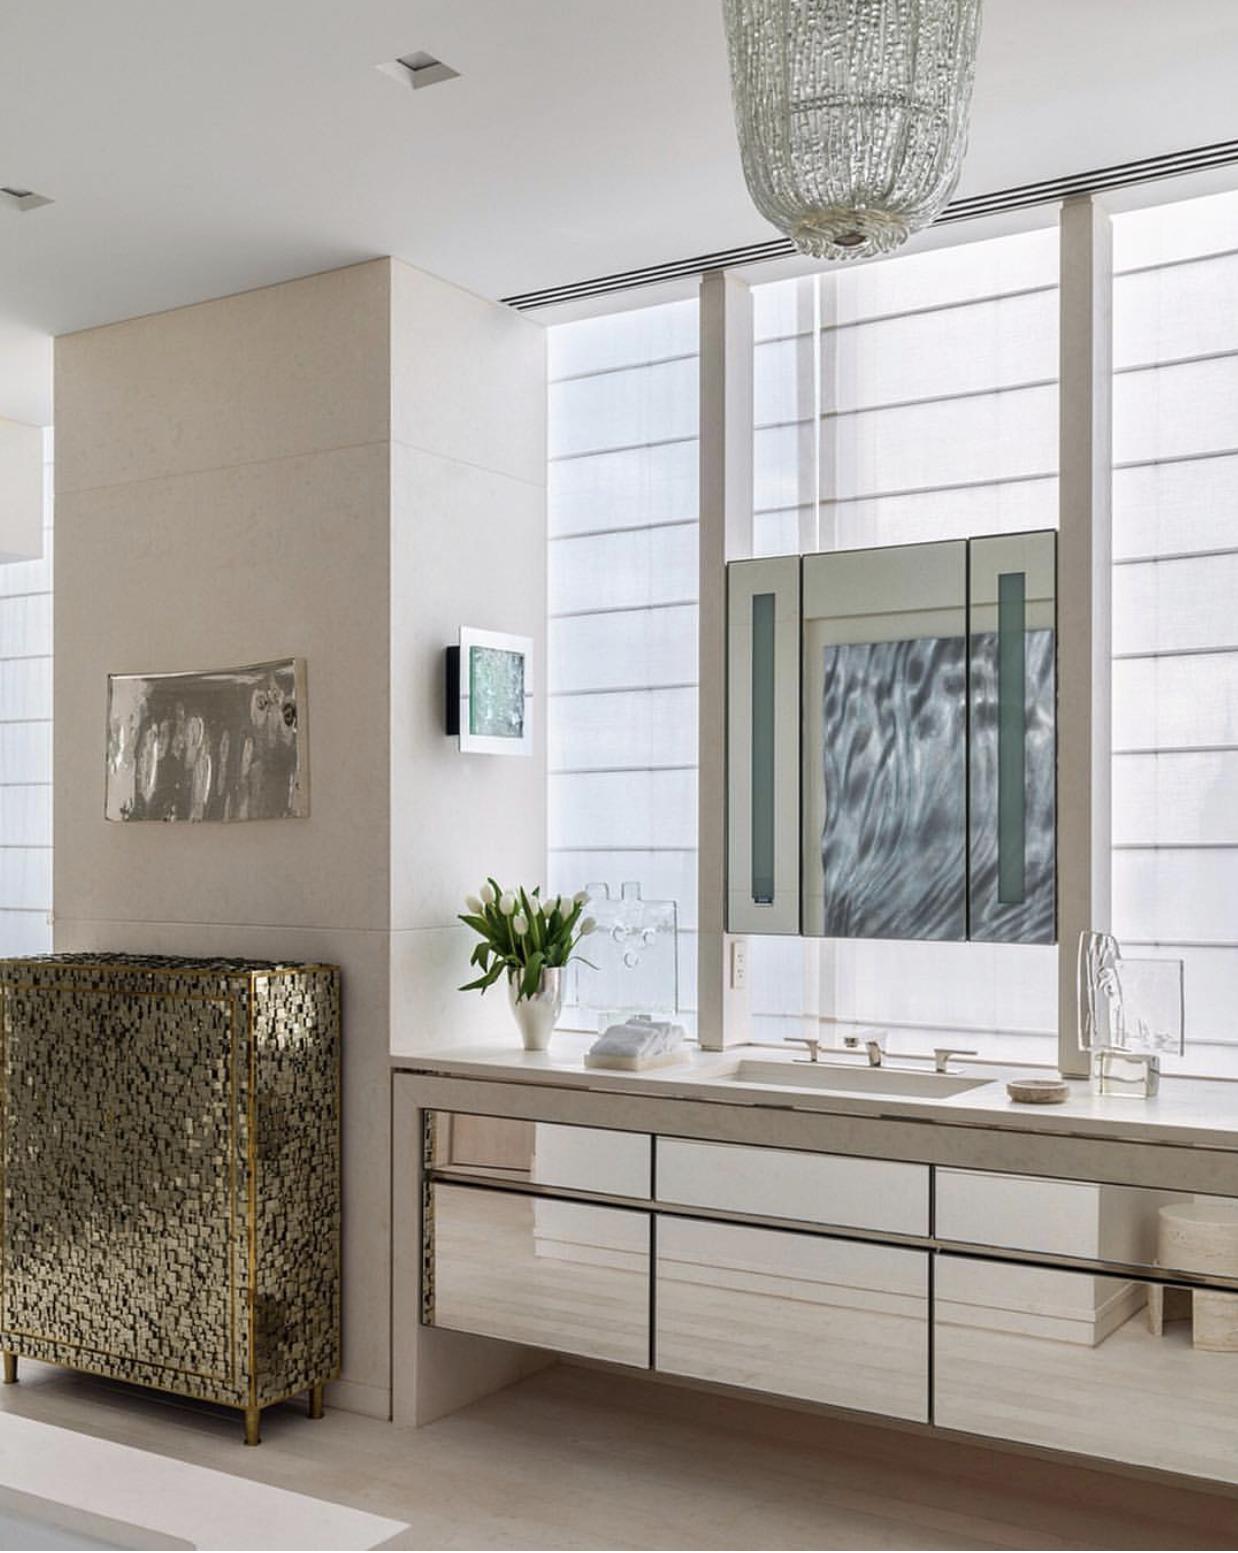 mirrored bath vanity | New york central, Central park ...